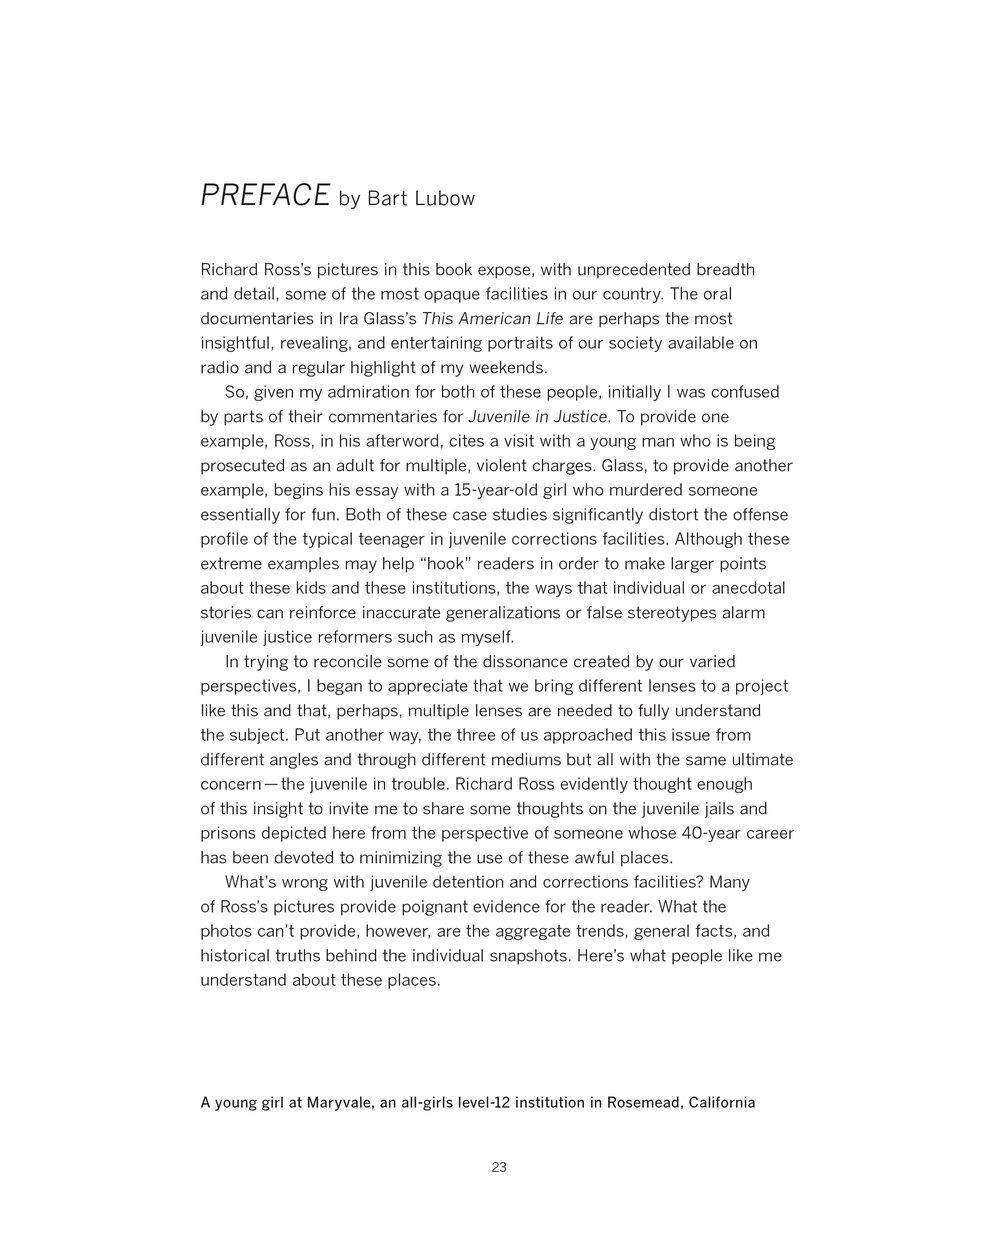 JiJ-Digital_Edition_Page_019_Image_0001.jpg